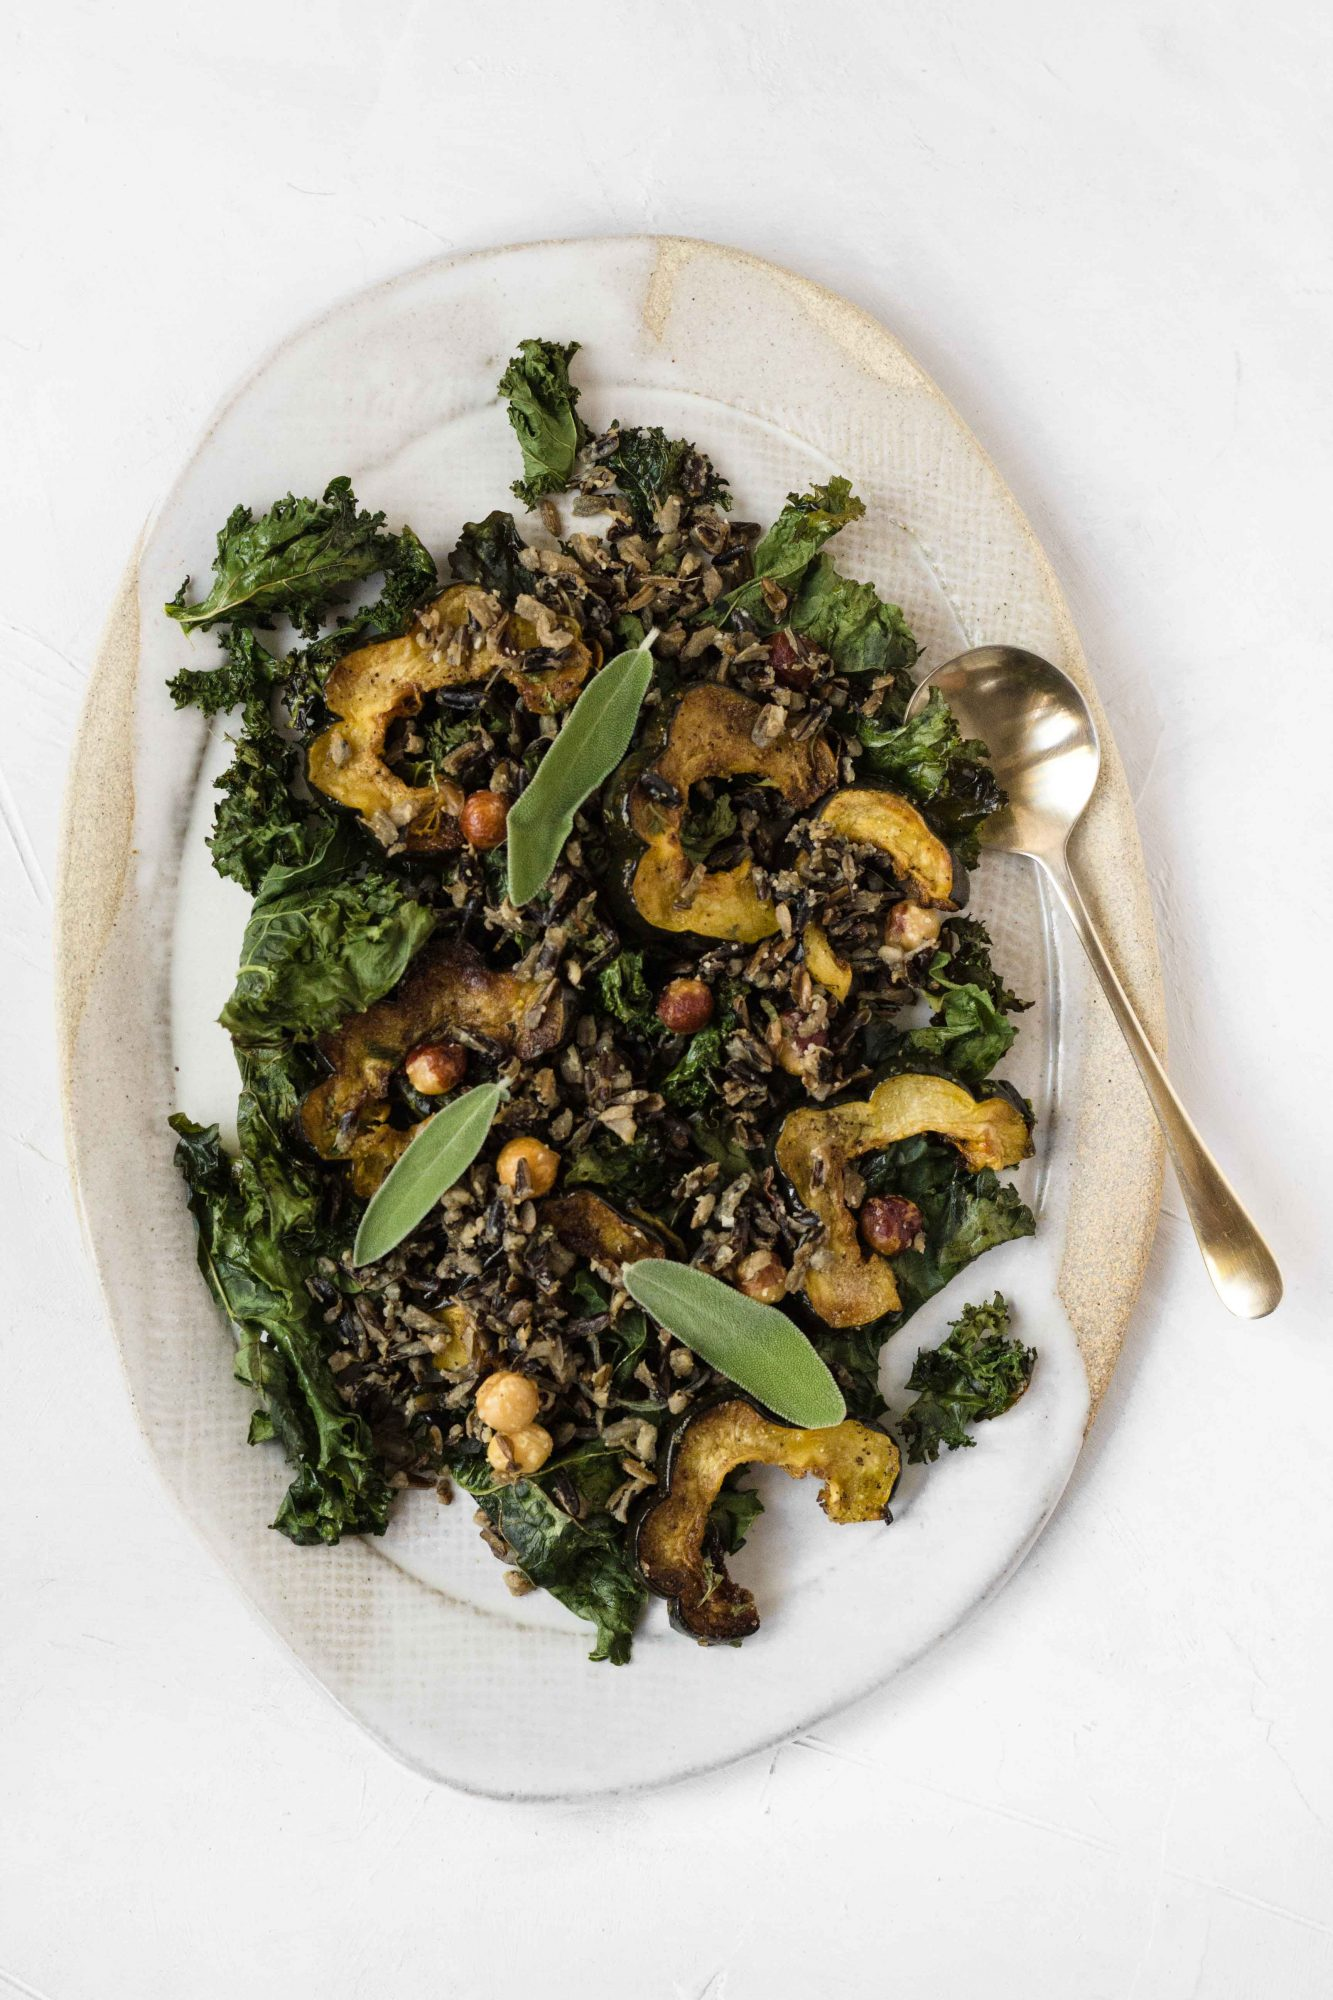 Crispy Kale Wild Rice Squash Salad